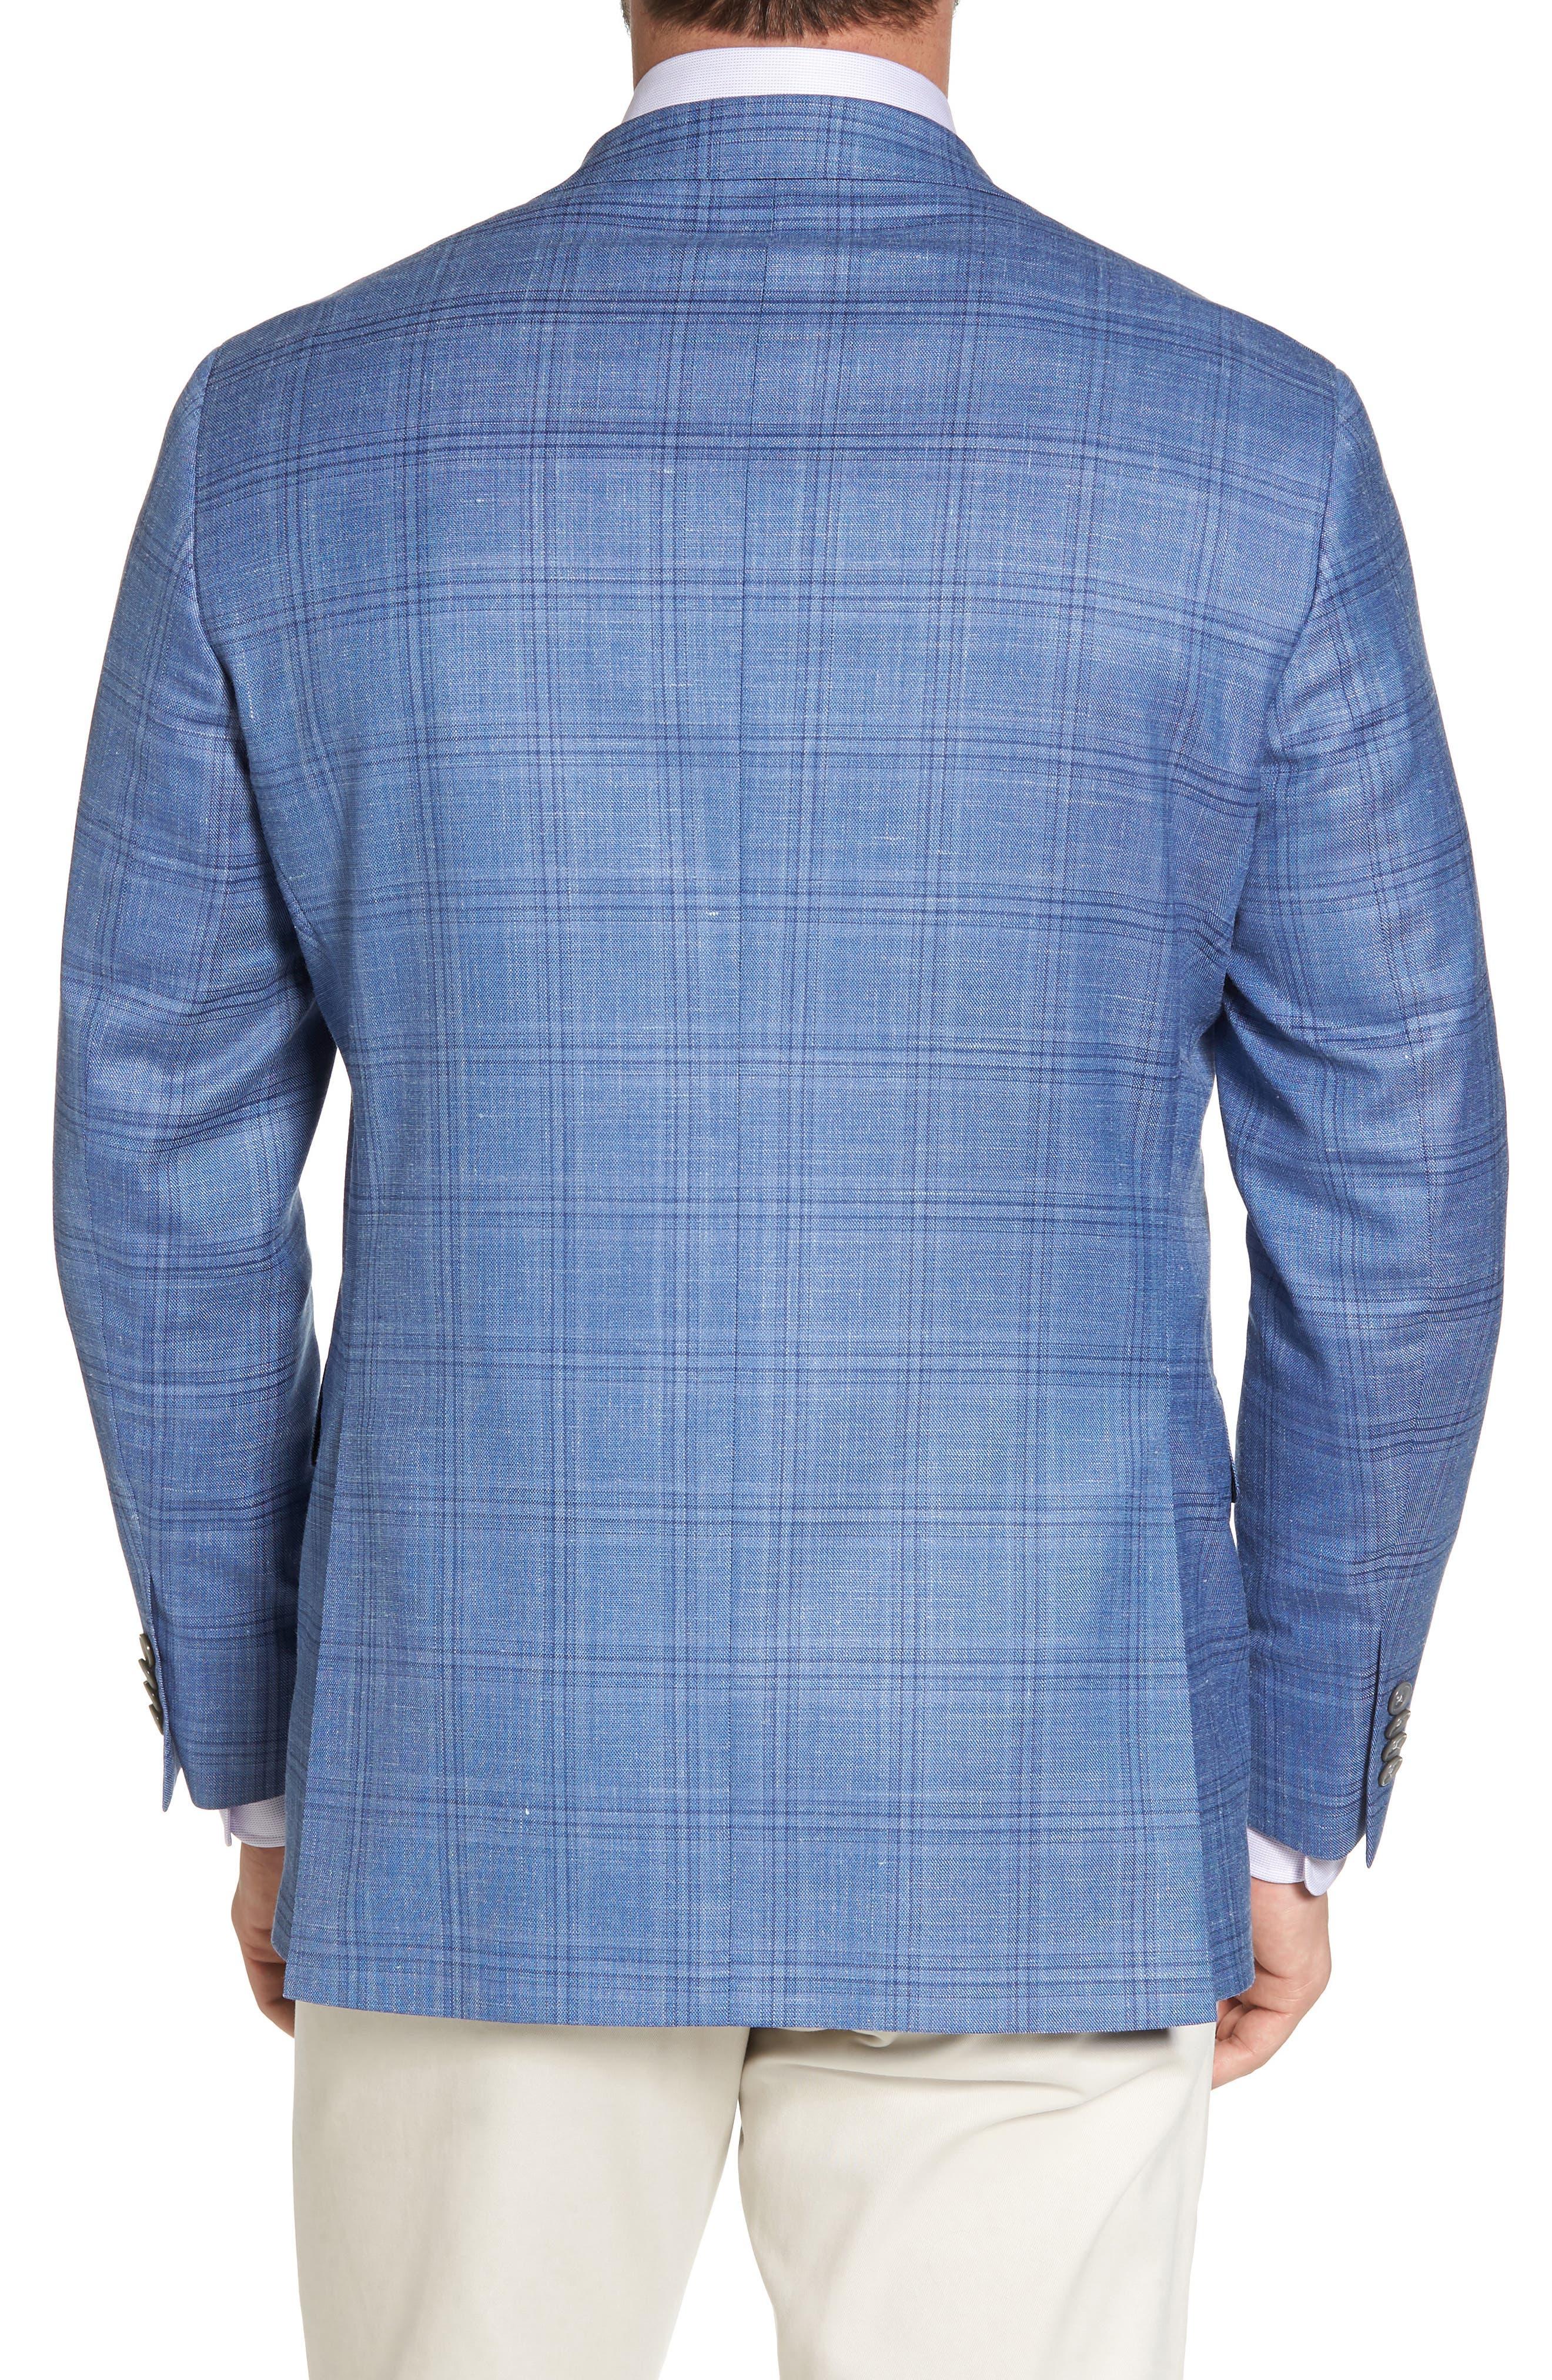 Arnold Classic Fit Plaid Wool Blend Sport Coat,                             Alternate thumbnail 2, color,                             400